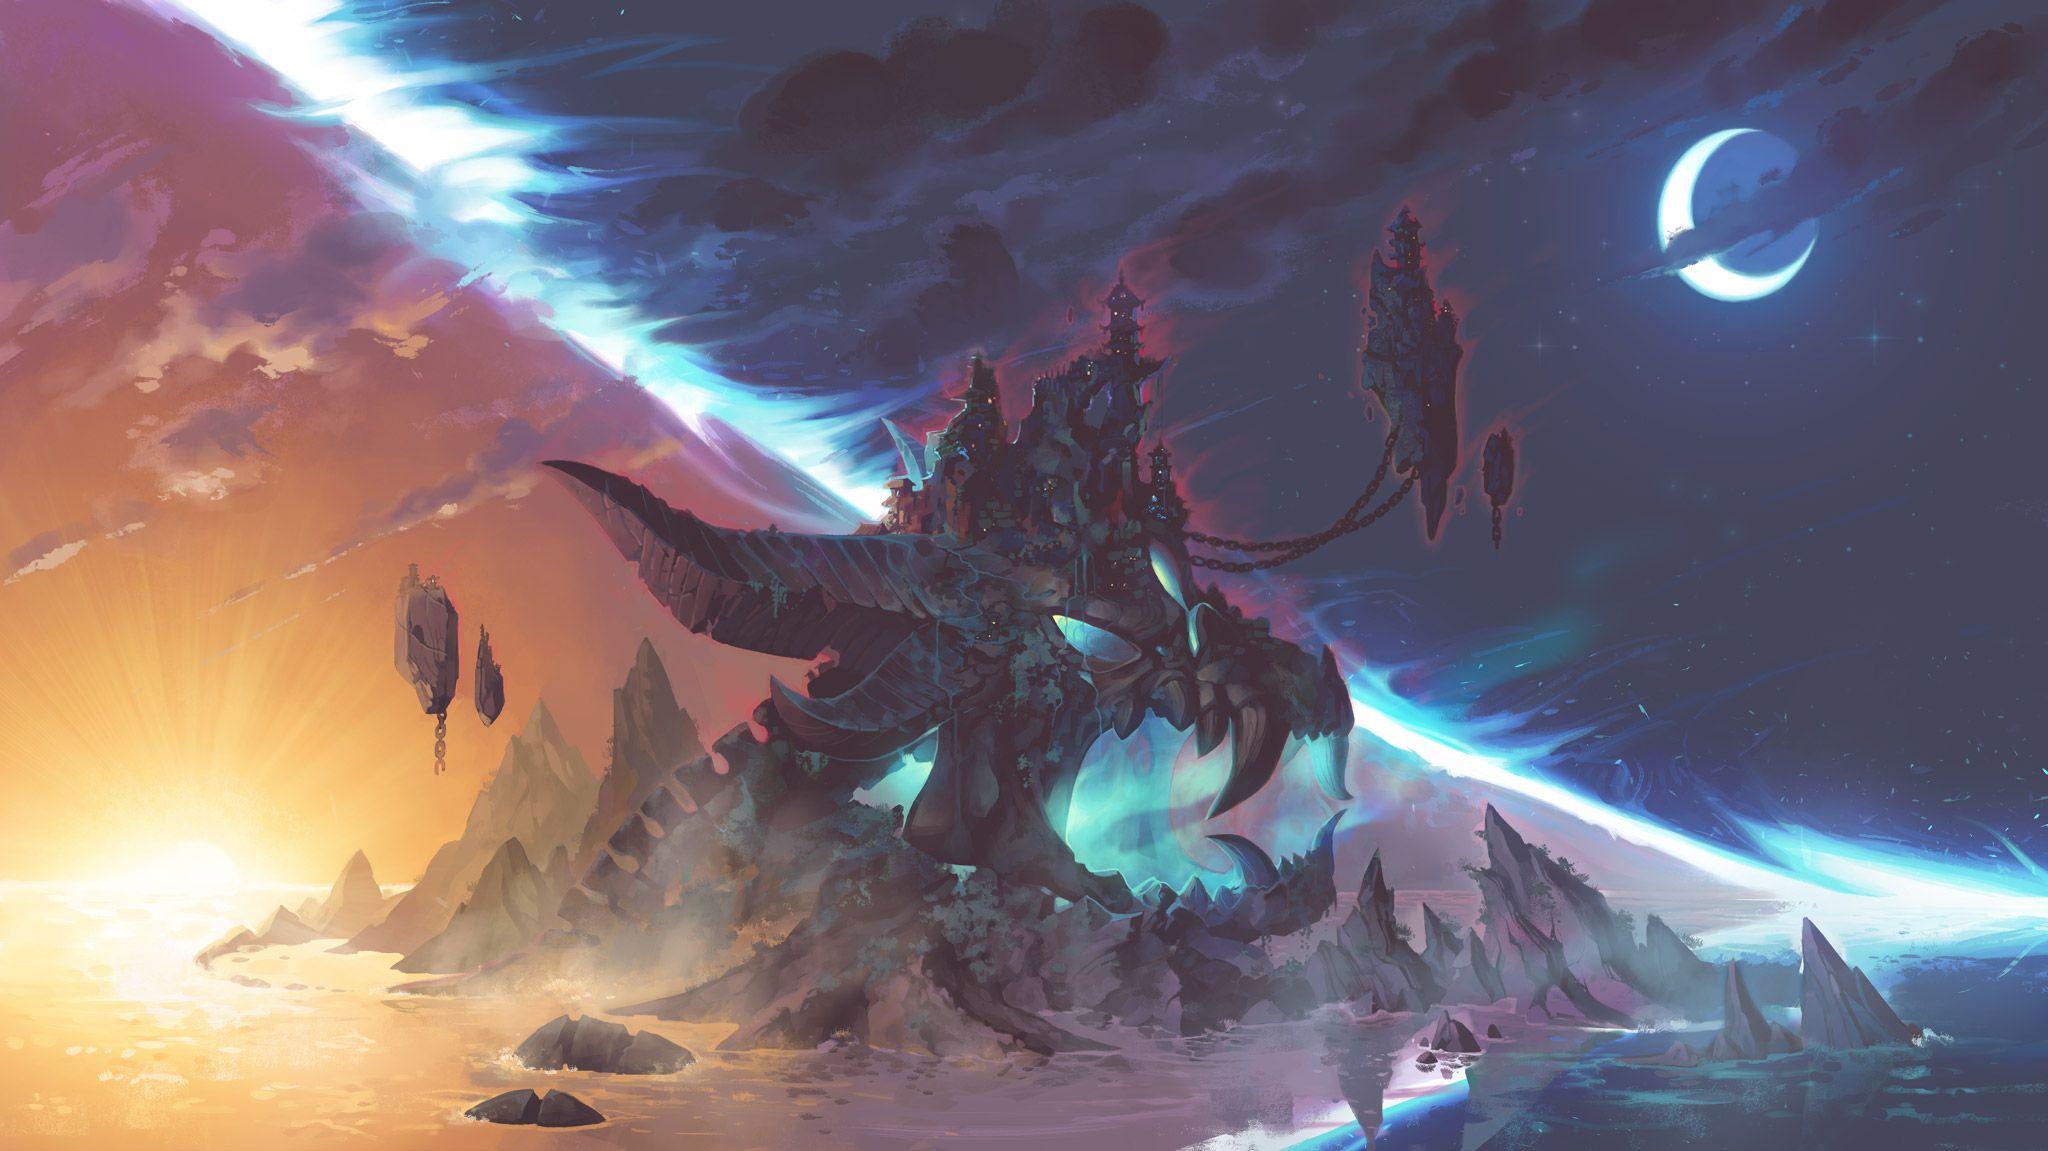 Brawlhalla Demon island 2048x1151 in 2020 Anime